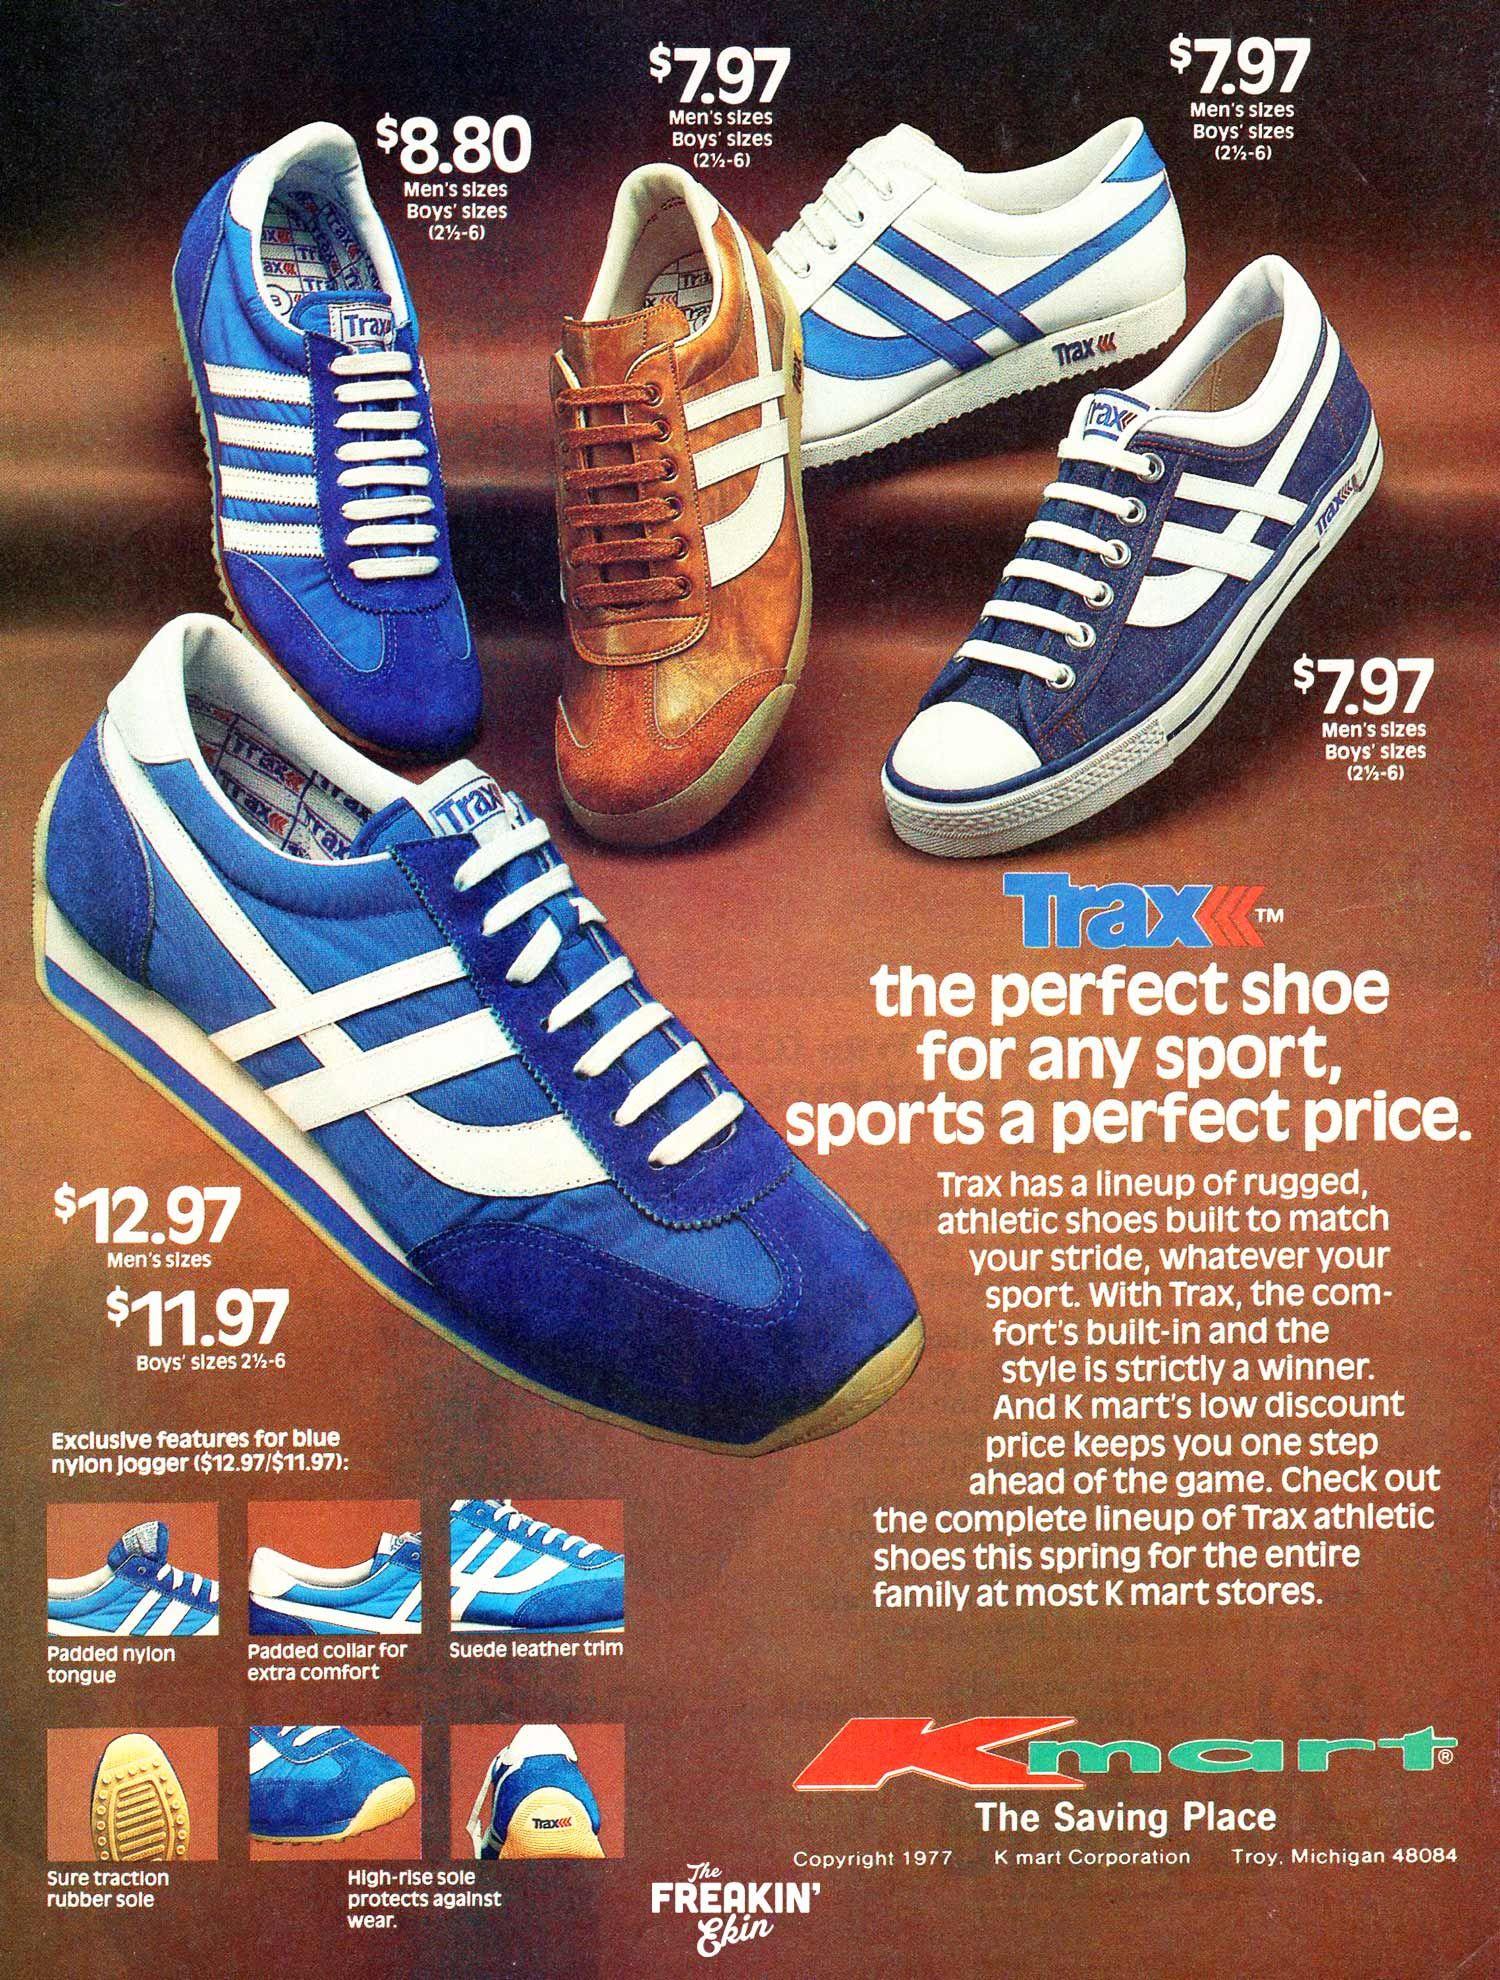 7f93b1b4a8d Kmart Trax 1977 vintage sneaker nylon joggers ad @ The Freakin' Ekin ...